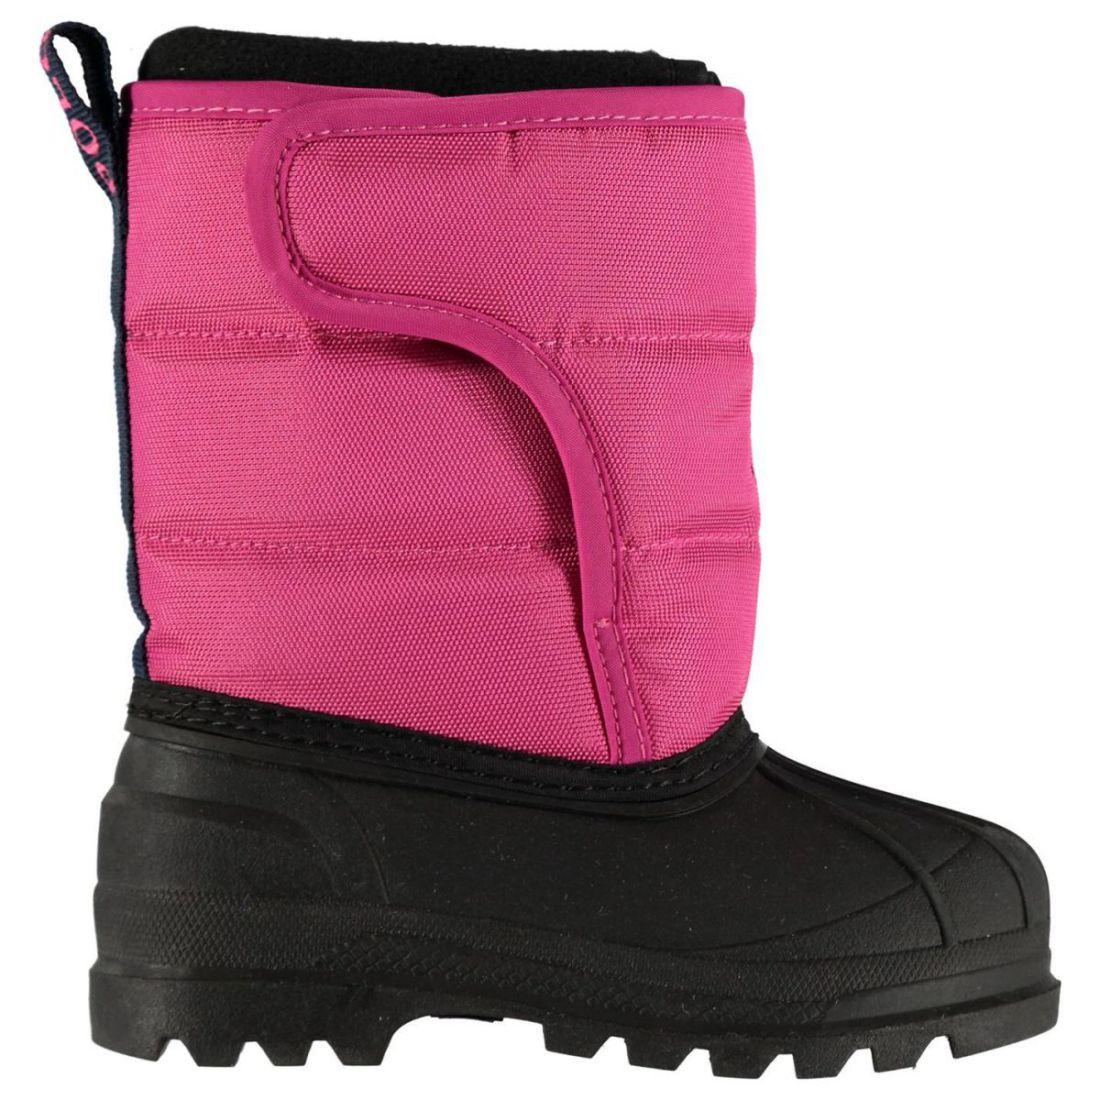 58697504135 Details about Kids Polo Ralph Lauren Hamilten II EZ Snow Boots Wellingtons  Touch and Close New